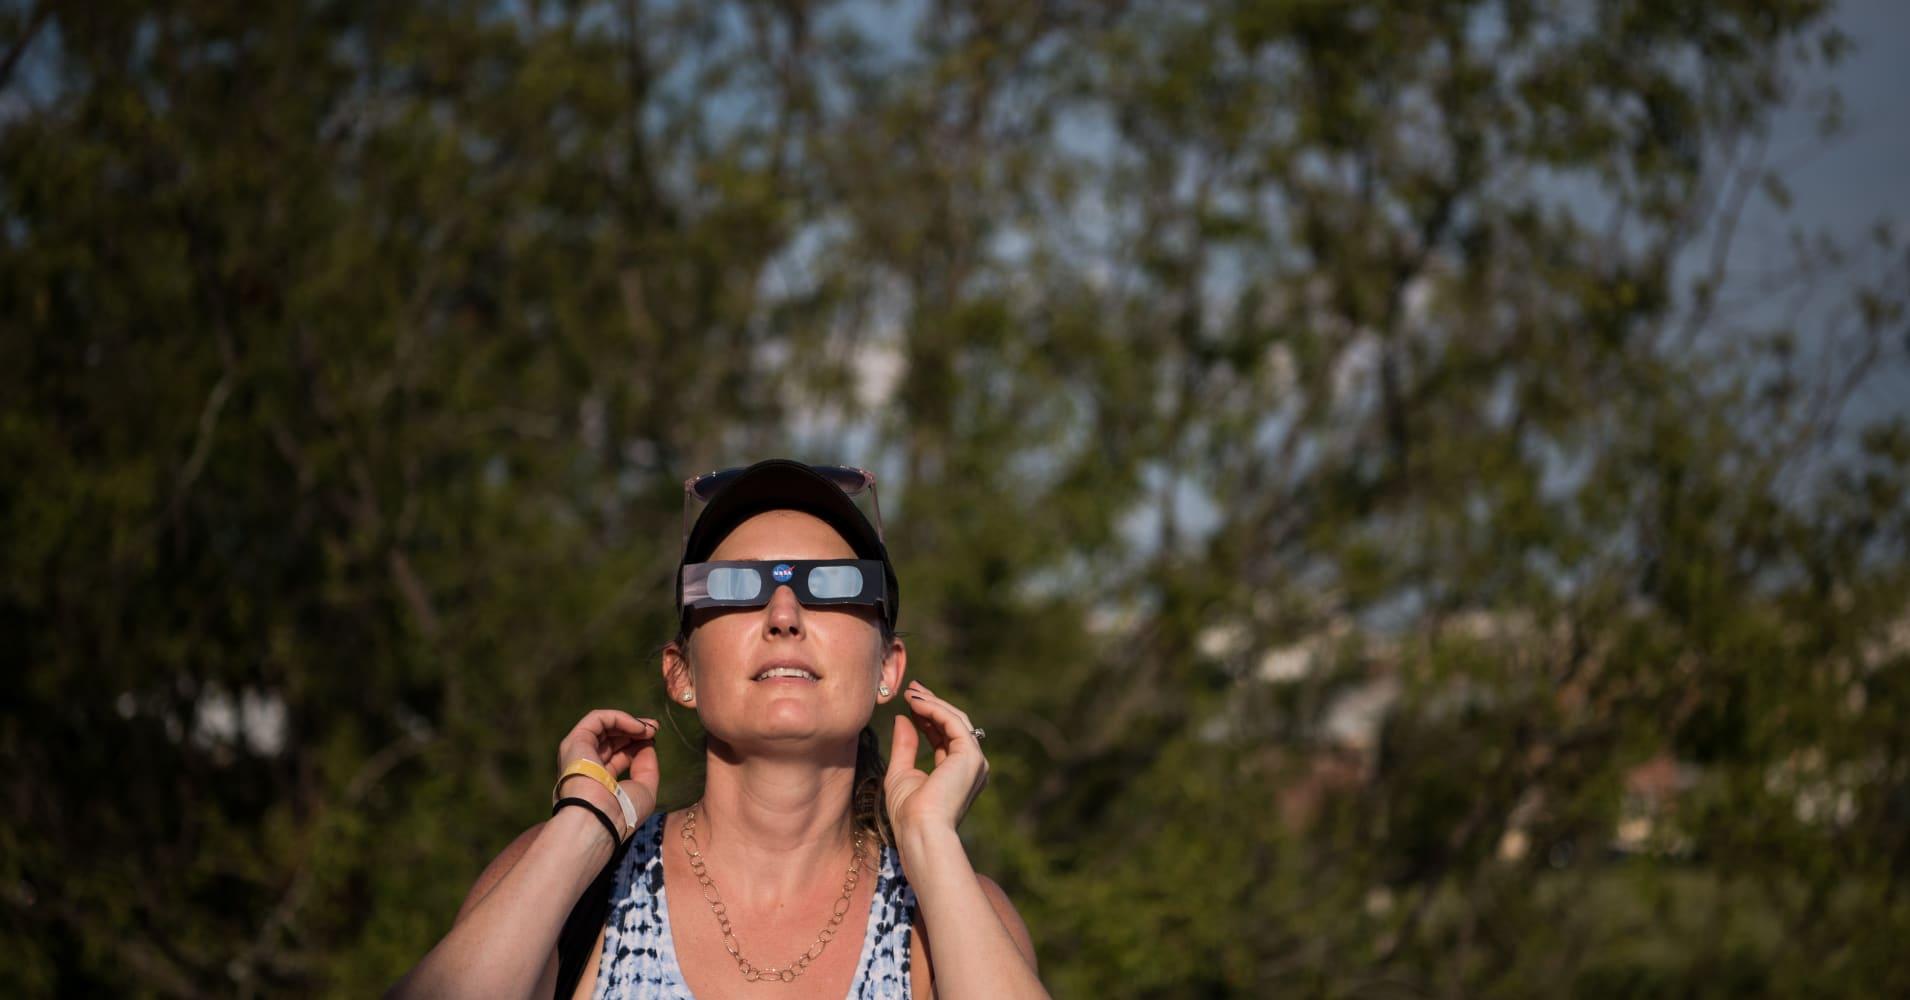 Millions converge across US to see sun go dark